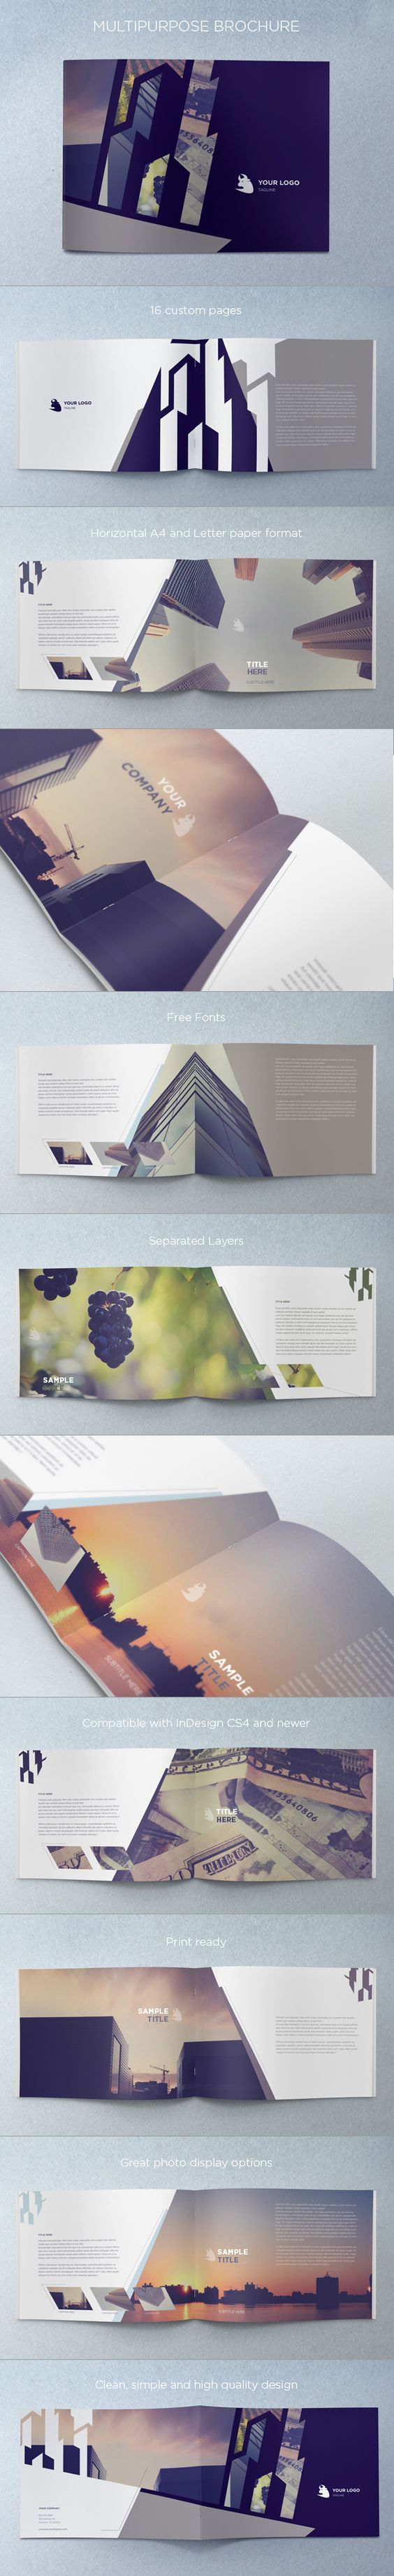 Multipurpose Brochure. Download here: http://graphicriver.net/item/multipurpose-brochure/4599702 #design #brochure: